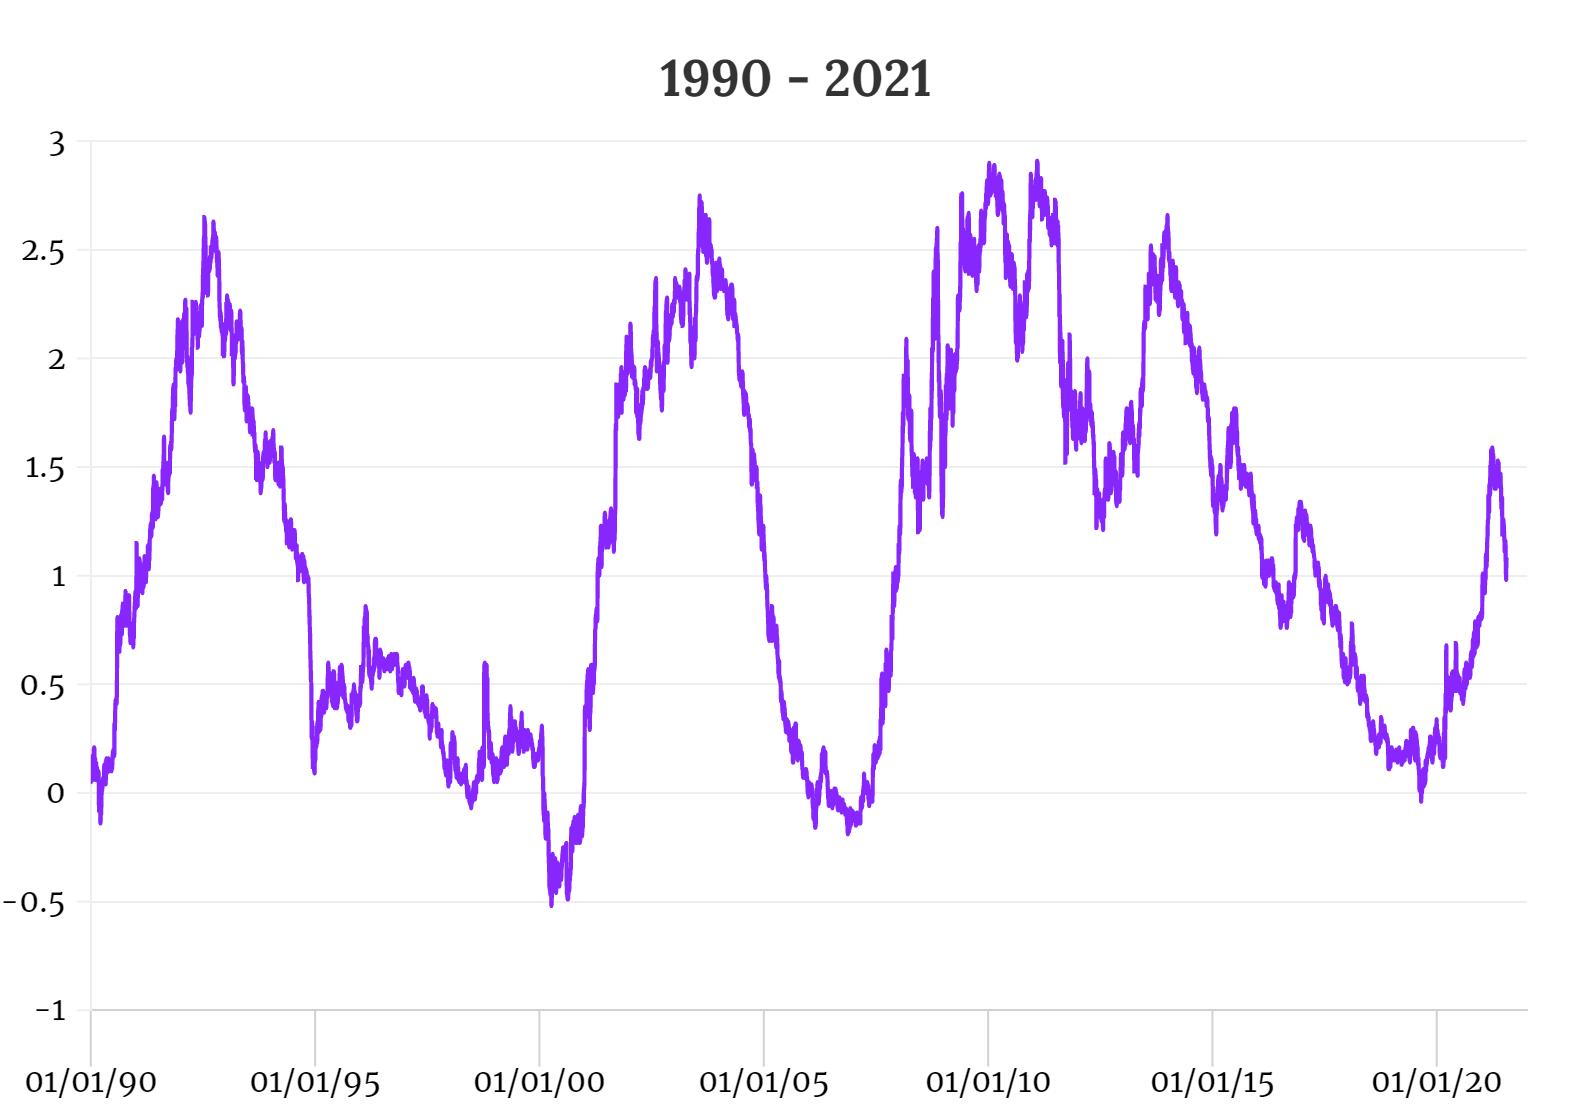 10-2 Year Treasury Yield (1990-2021)